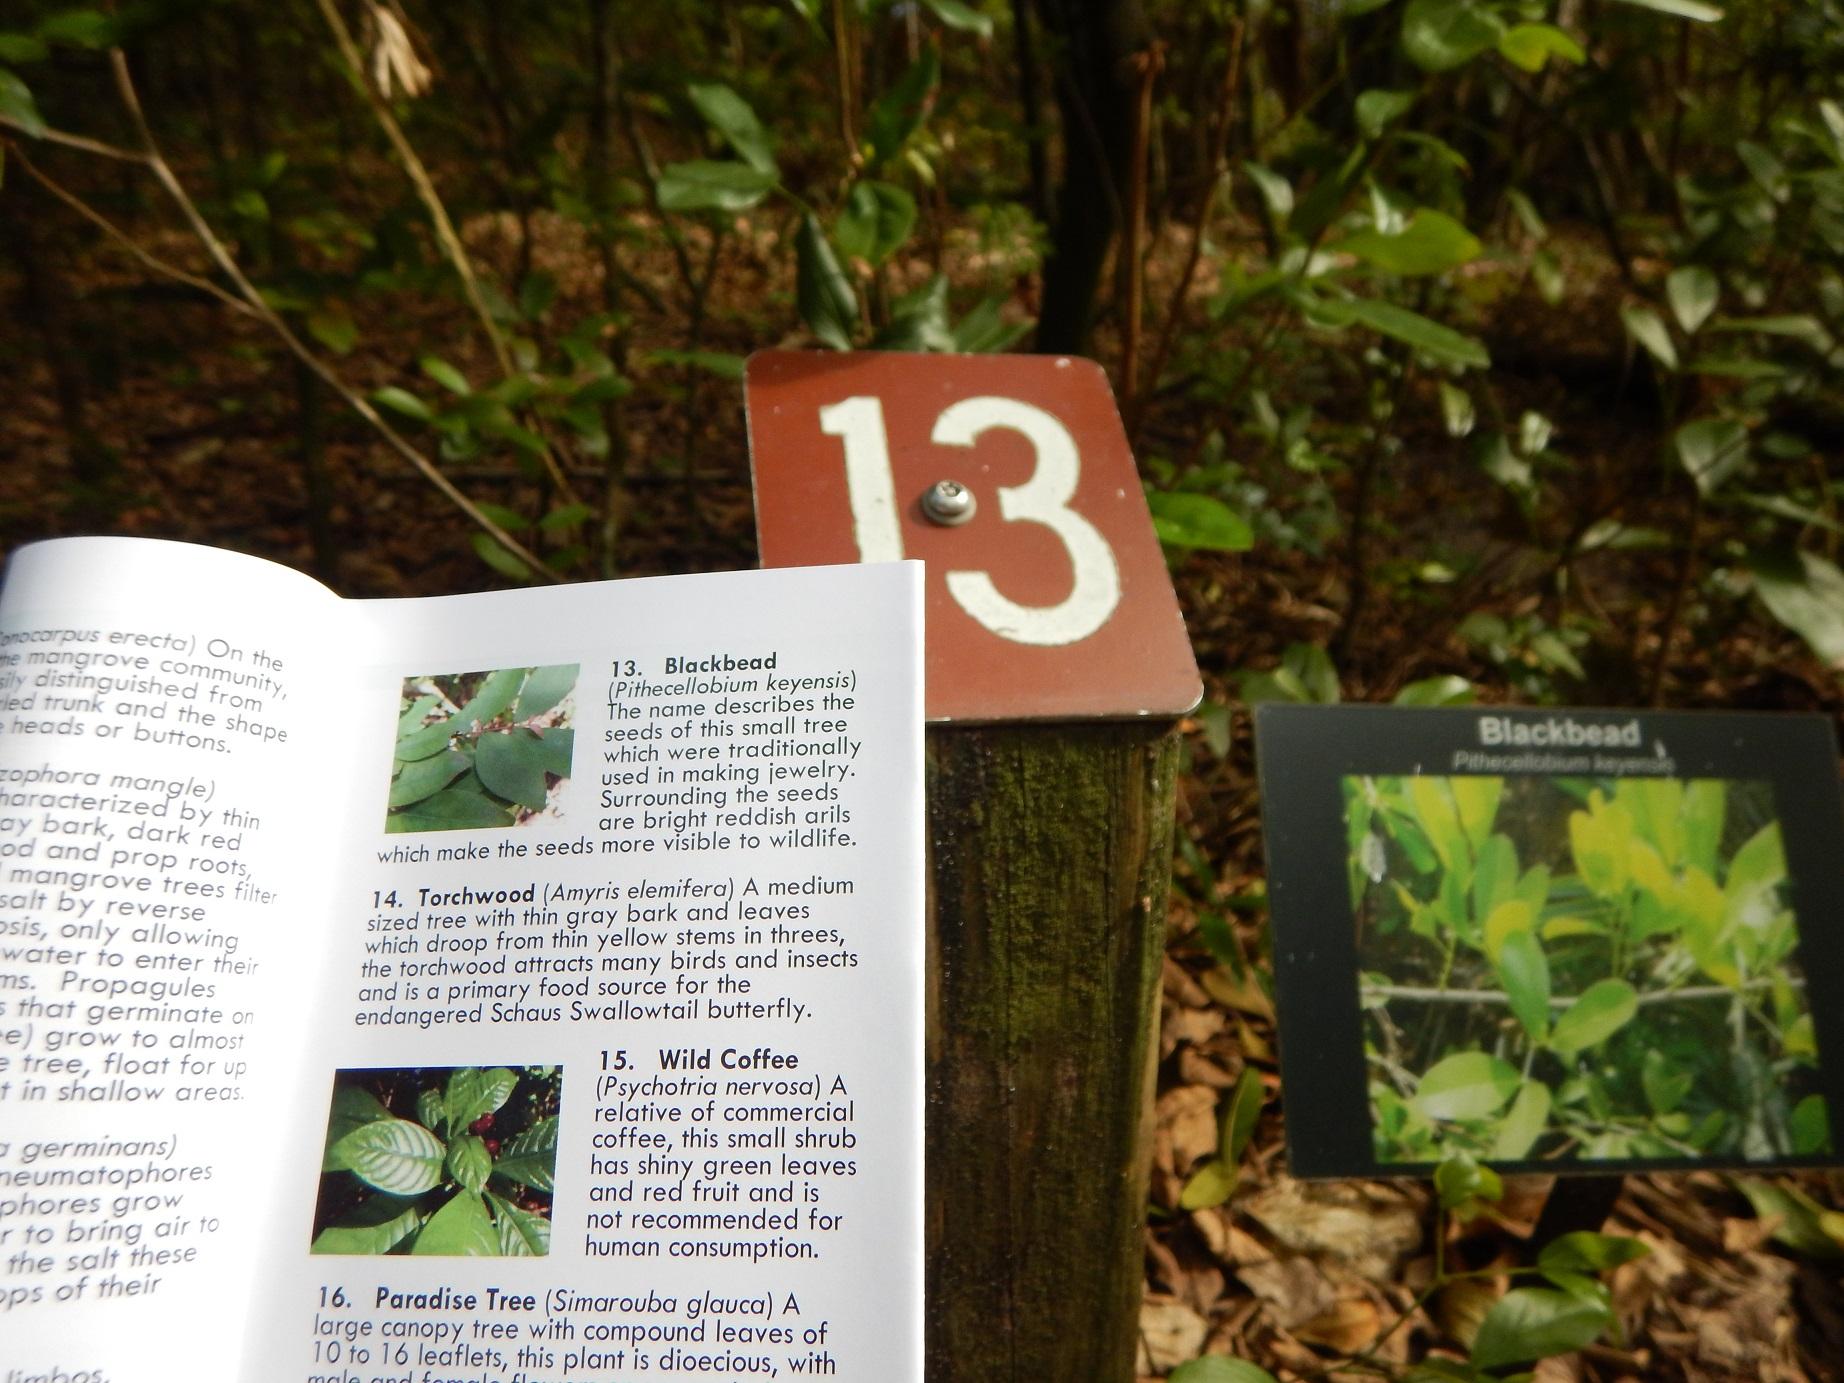 Park Plants Guide at John D Macarthur Beach State Park